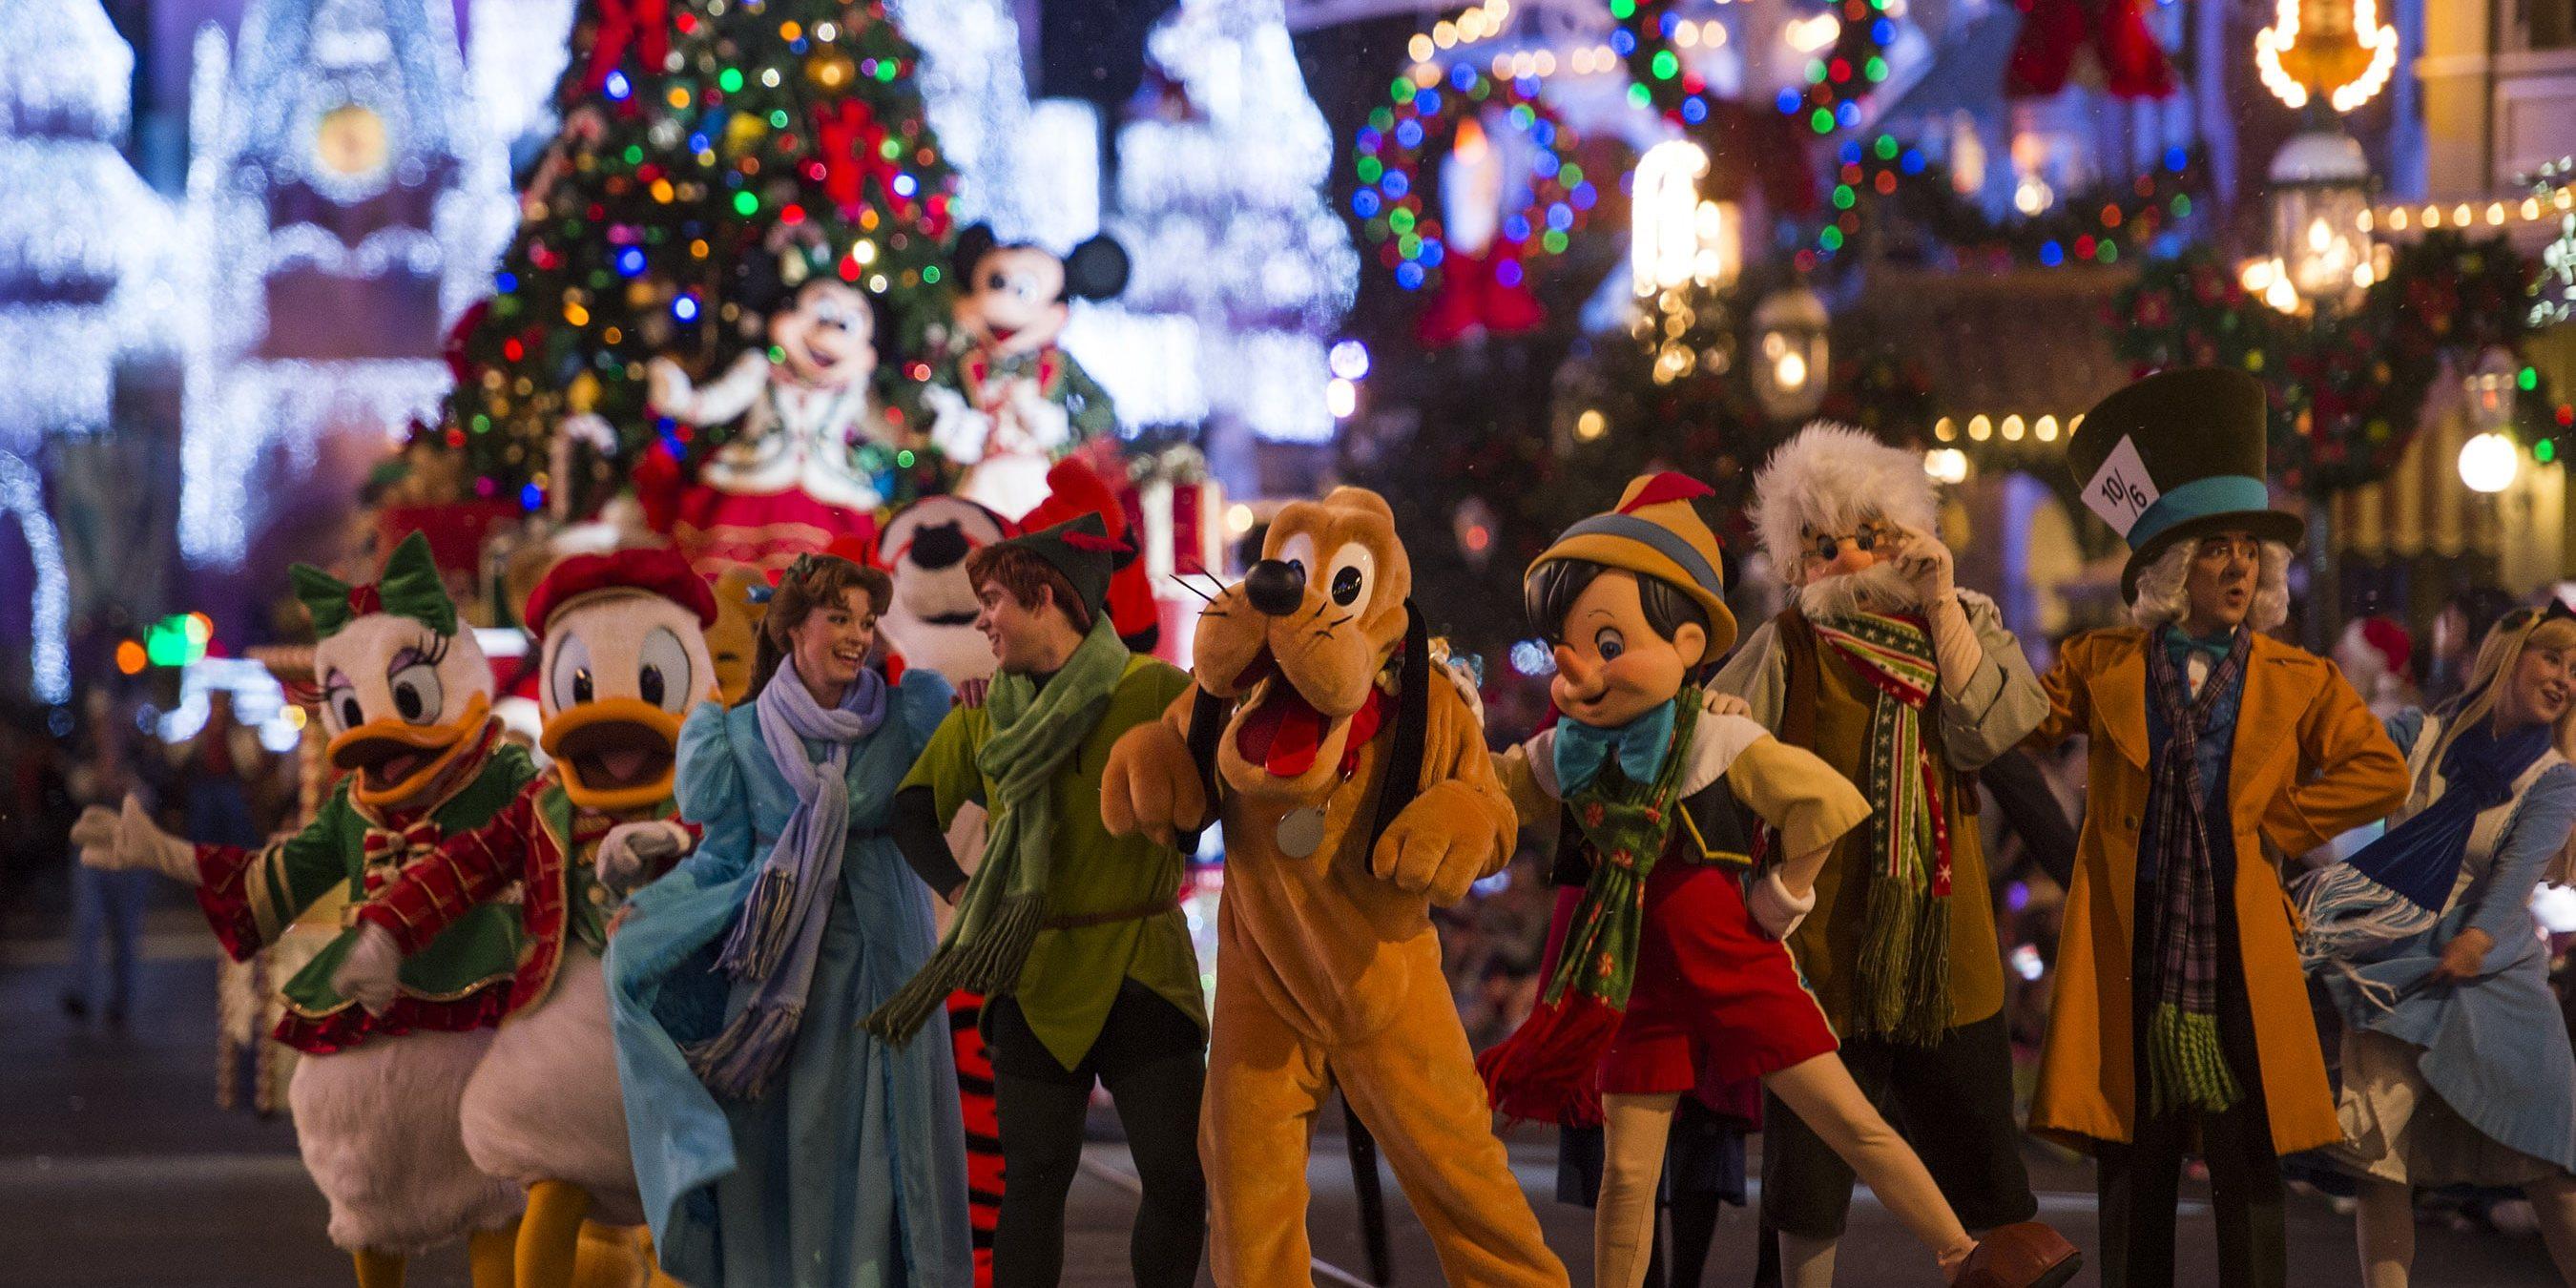 Christmas Events To Enjoy At Disney World